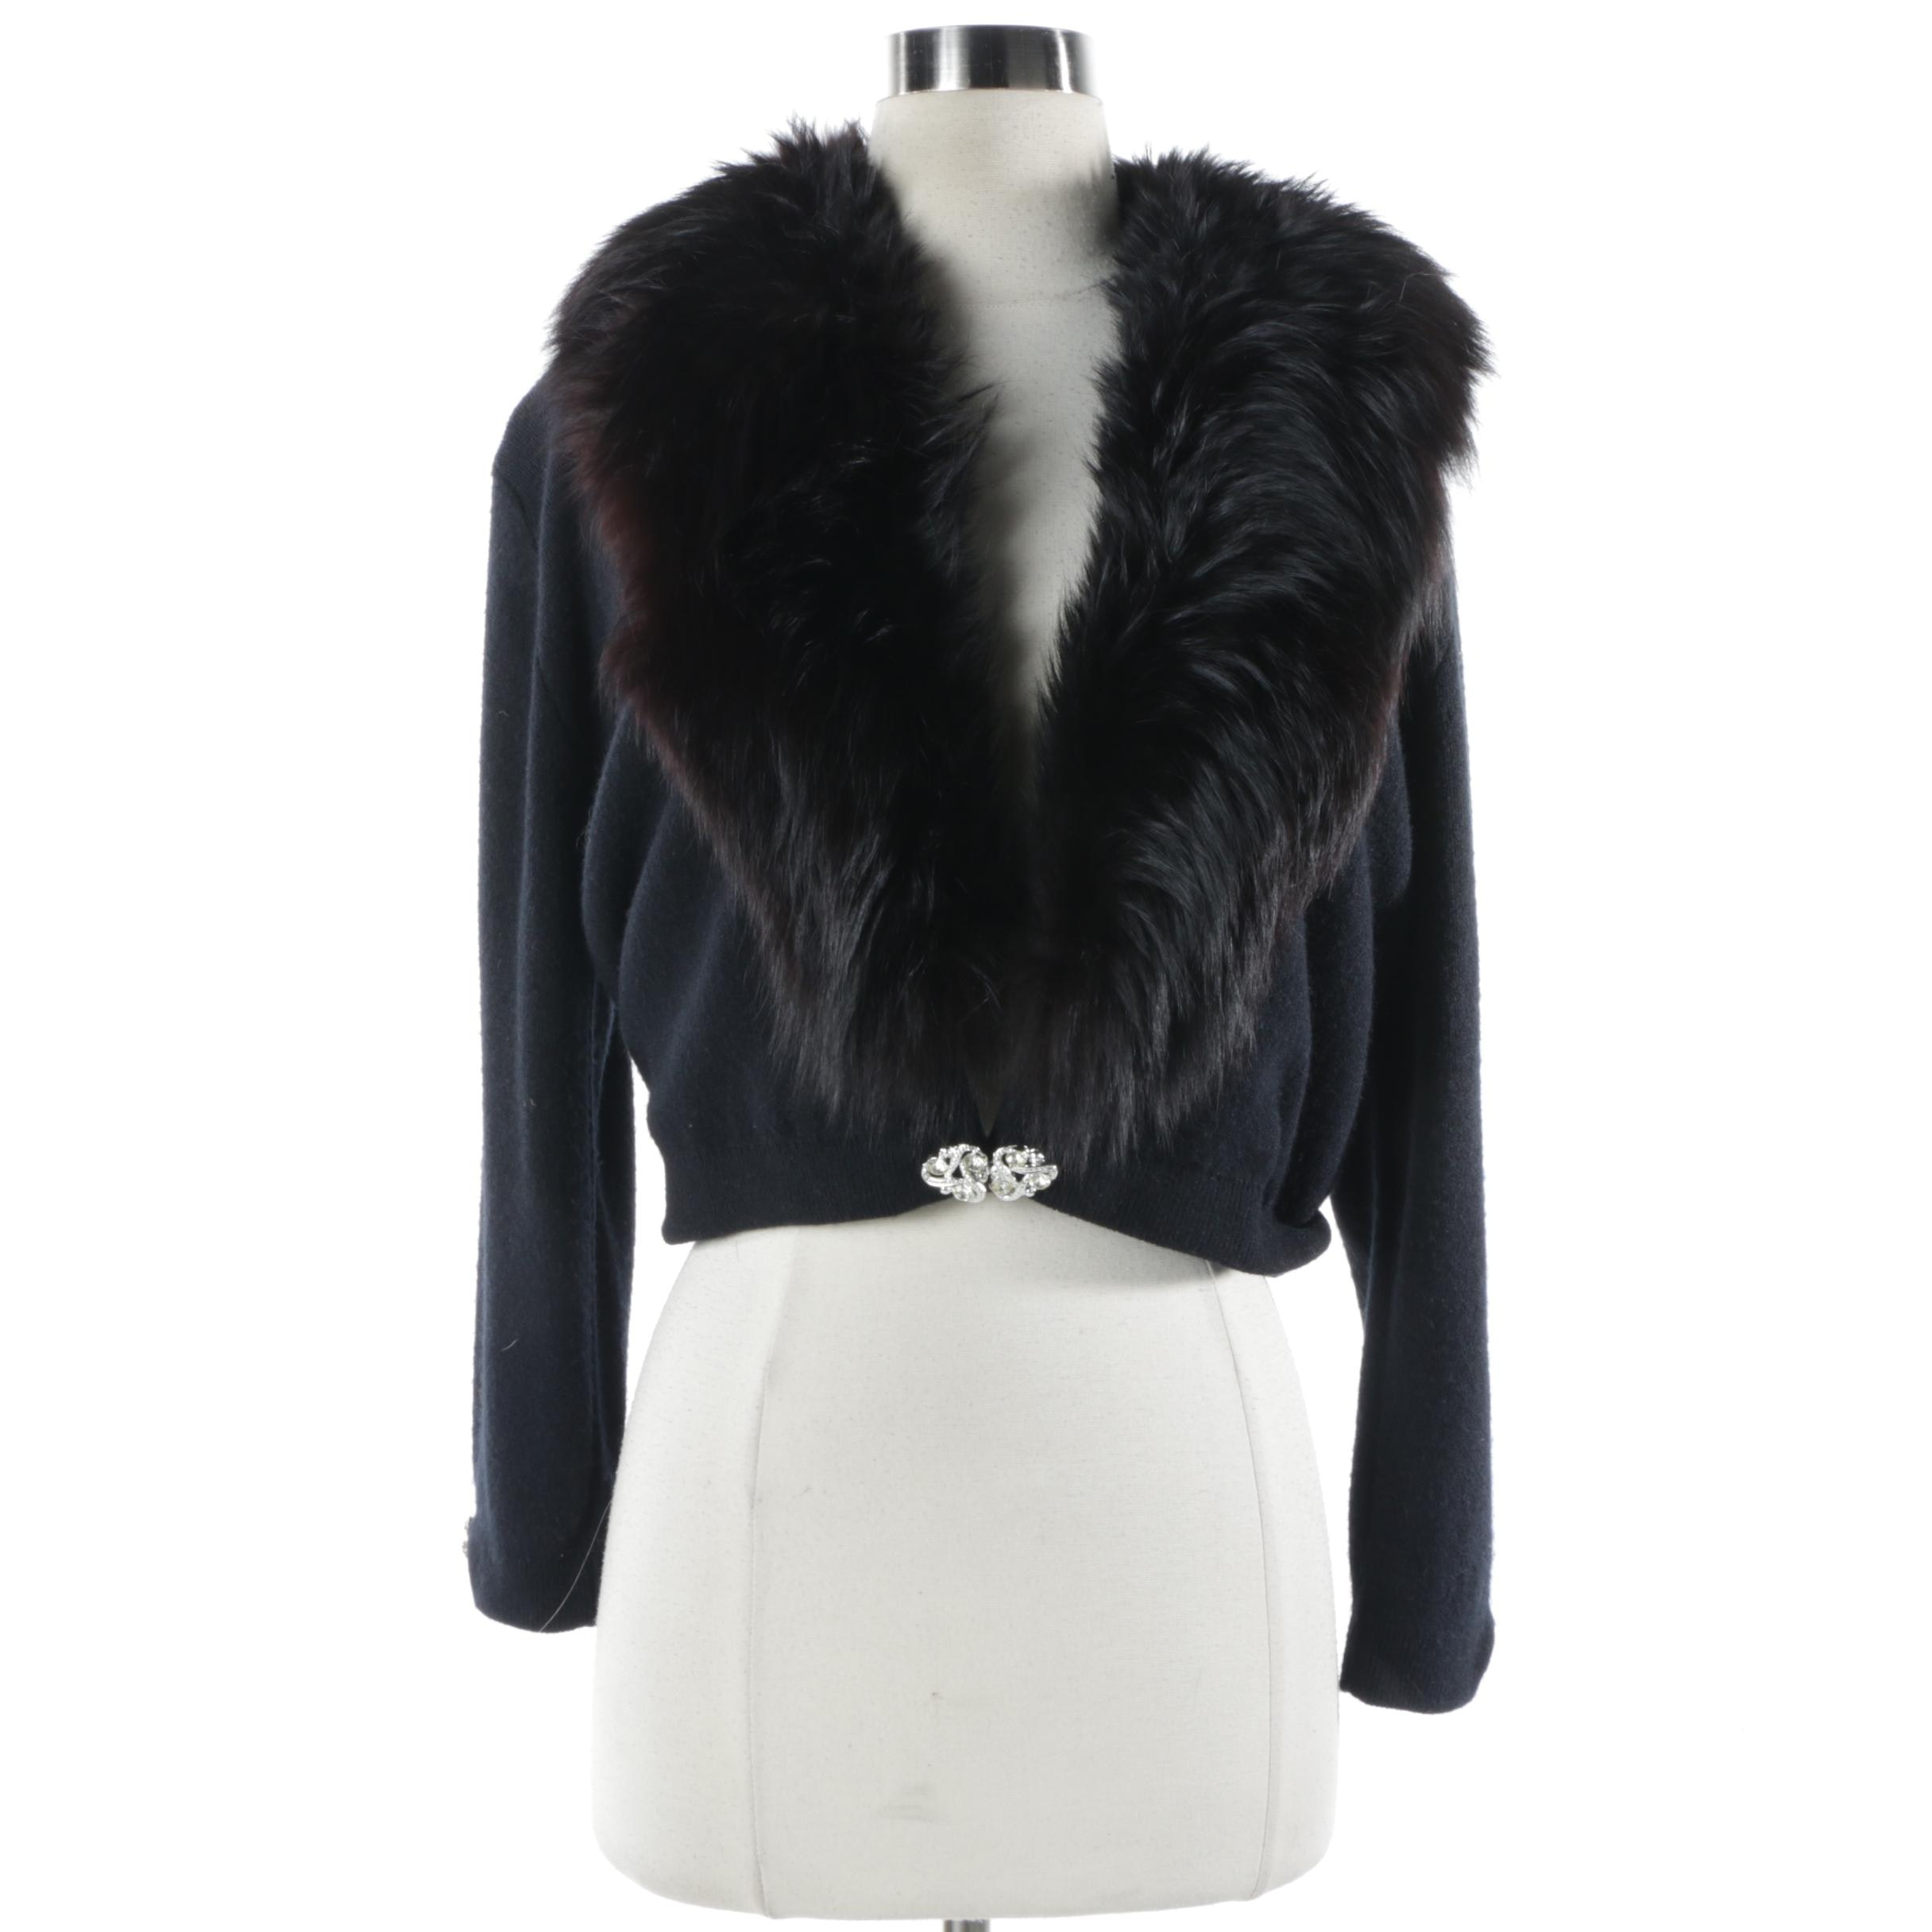 Vintage Black Knit Sweater with Black Fox Fur Collar